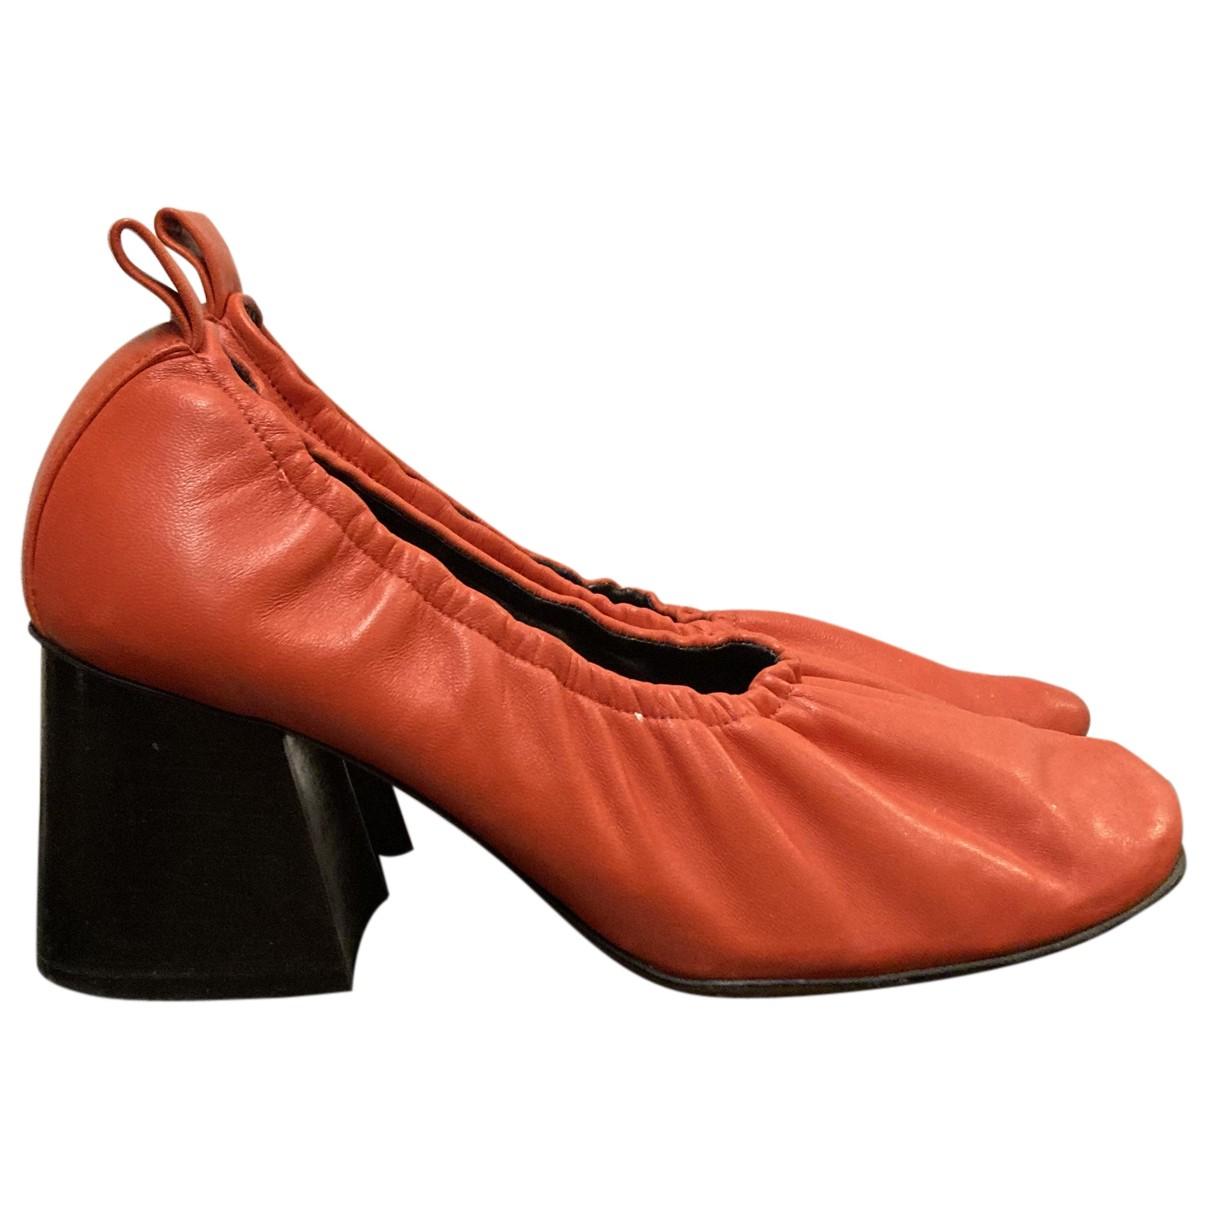 Celine Soft Ballerina Red Leather Heels for Women